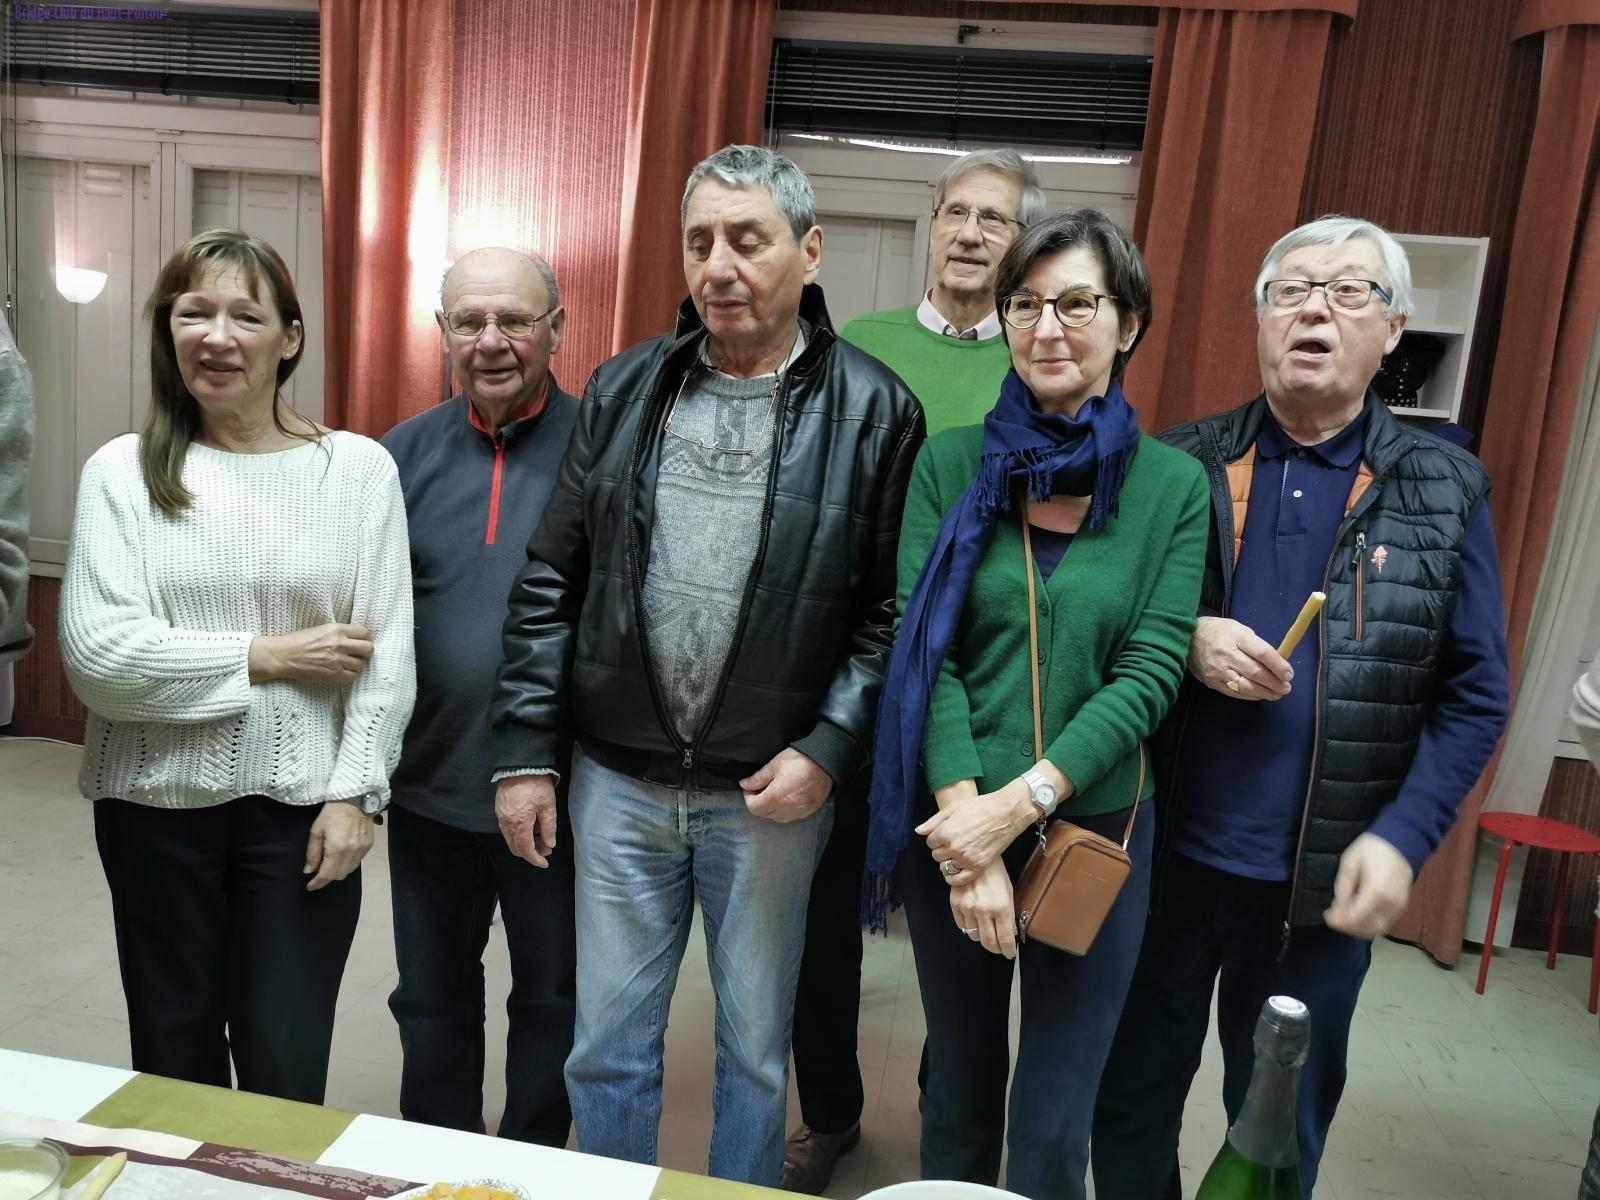 Les-Claude-Claudine-Claude-Moulai-Claude-Moulai-Claude-Myon-Claude-Guérin-Claude-Pasquay